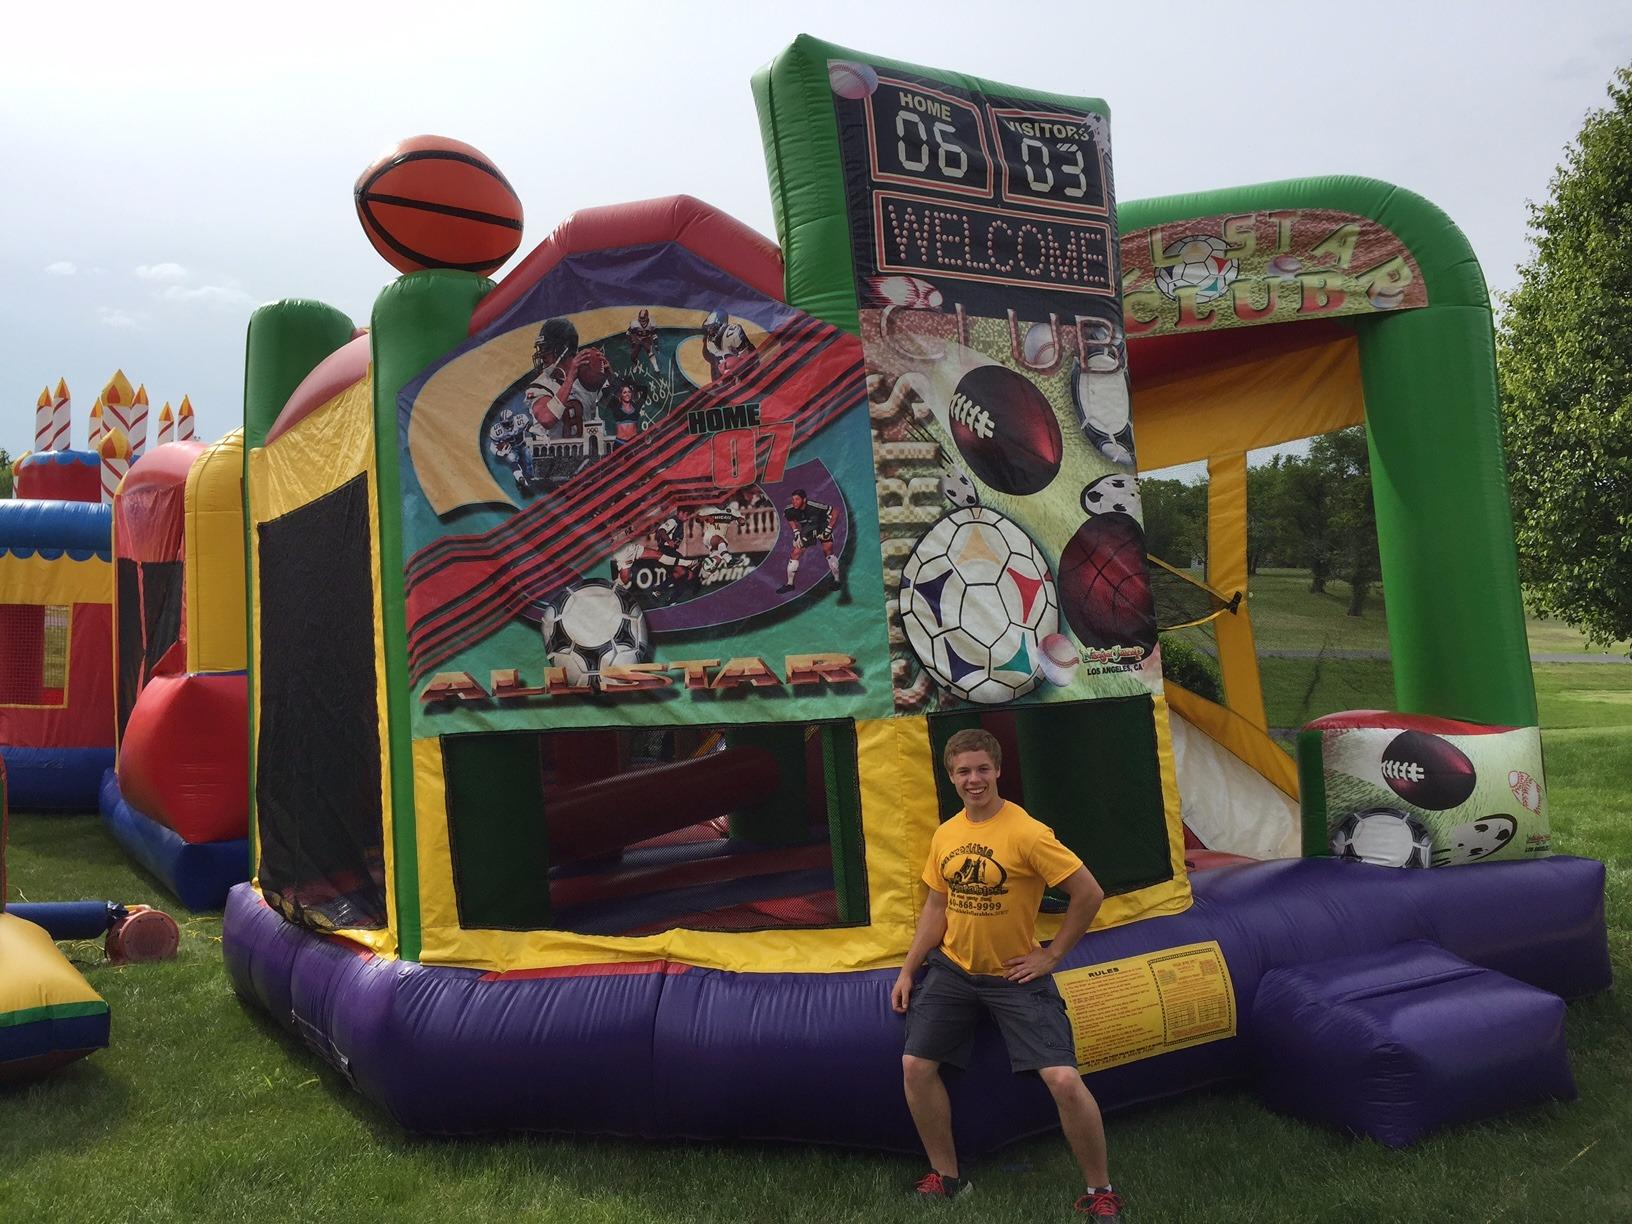 Incredible Inflatables LLC image 11